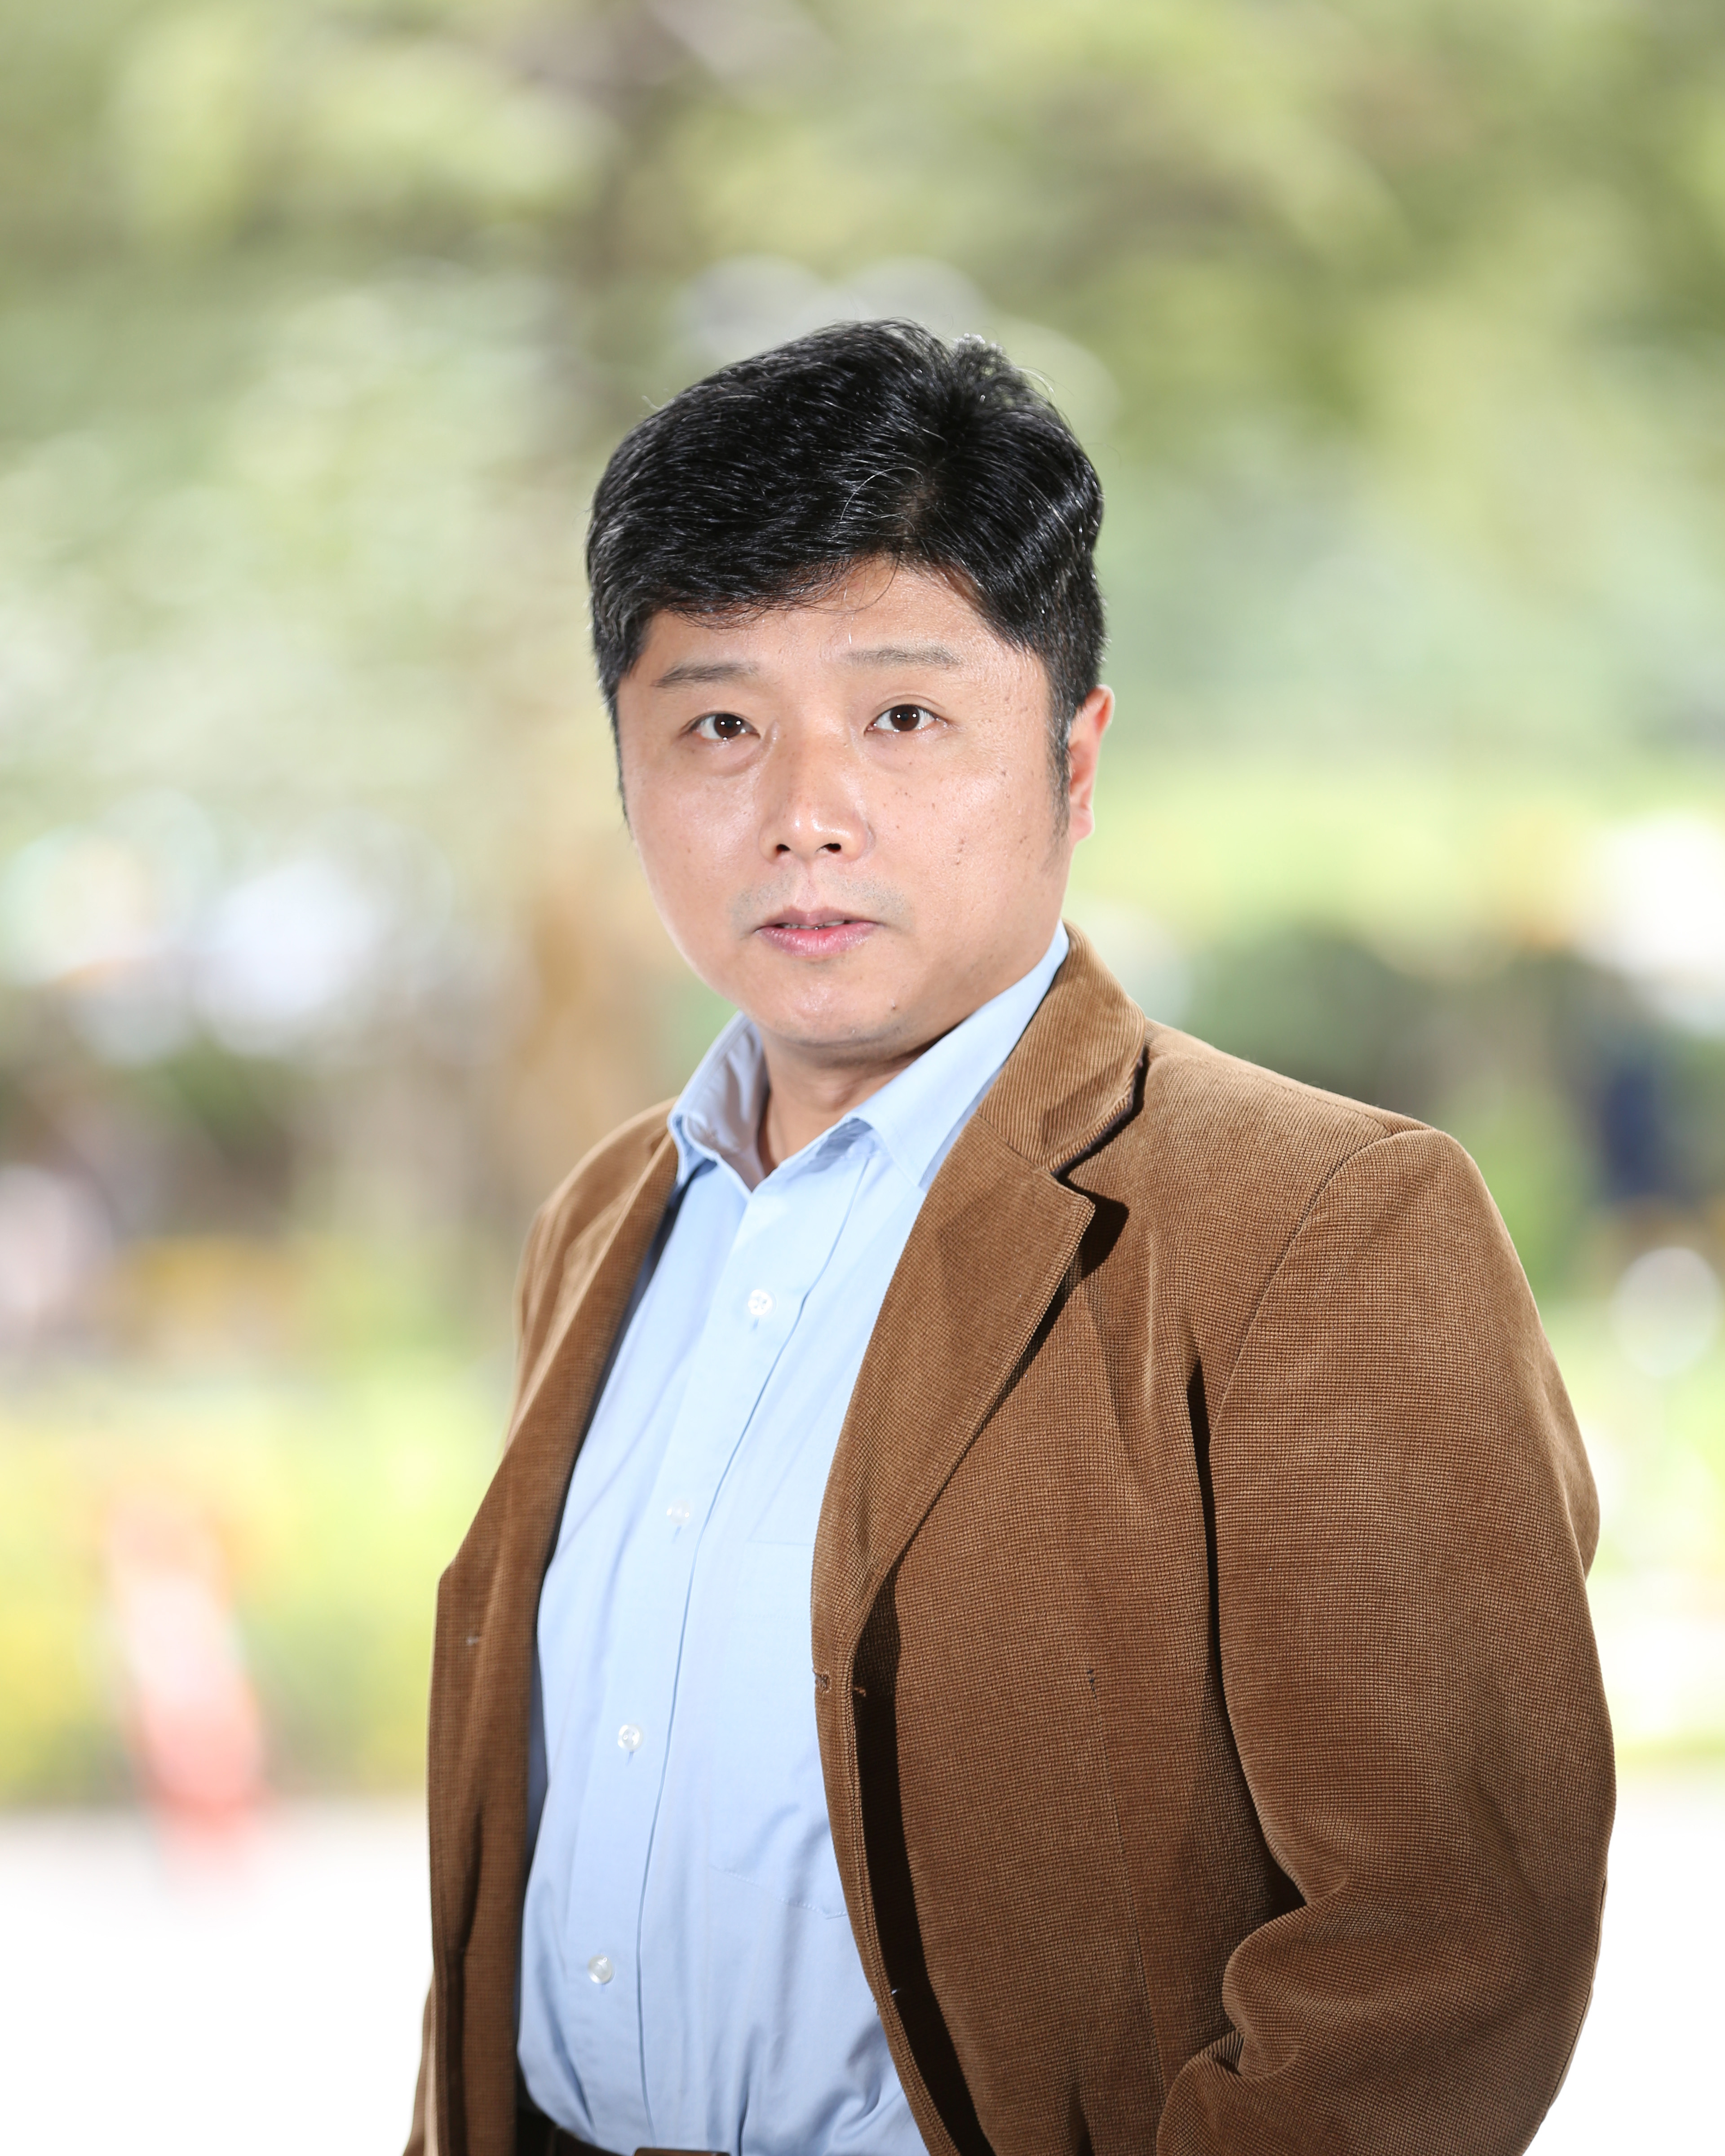 Zhi Xu, Director of Laboratories